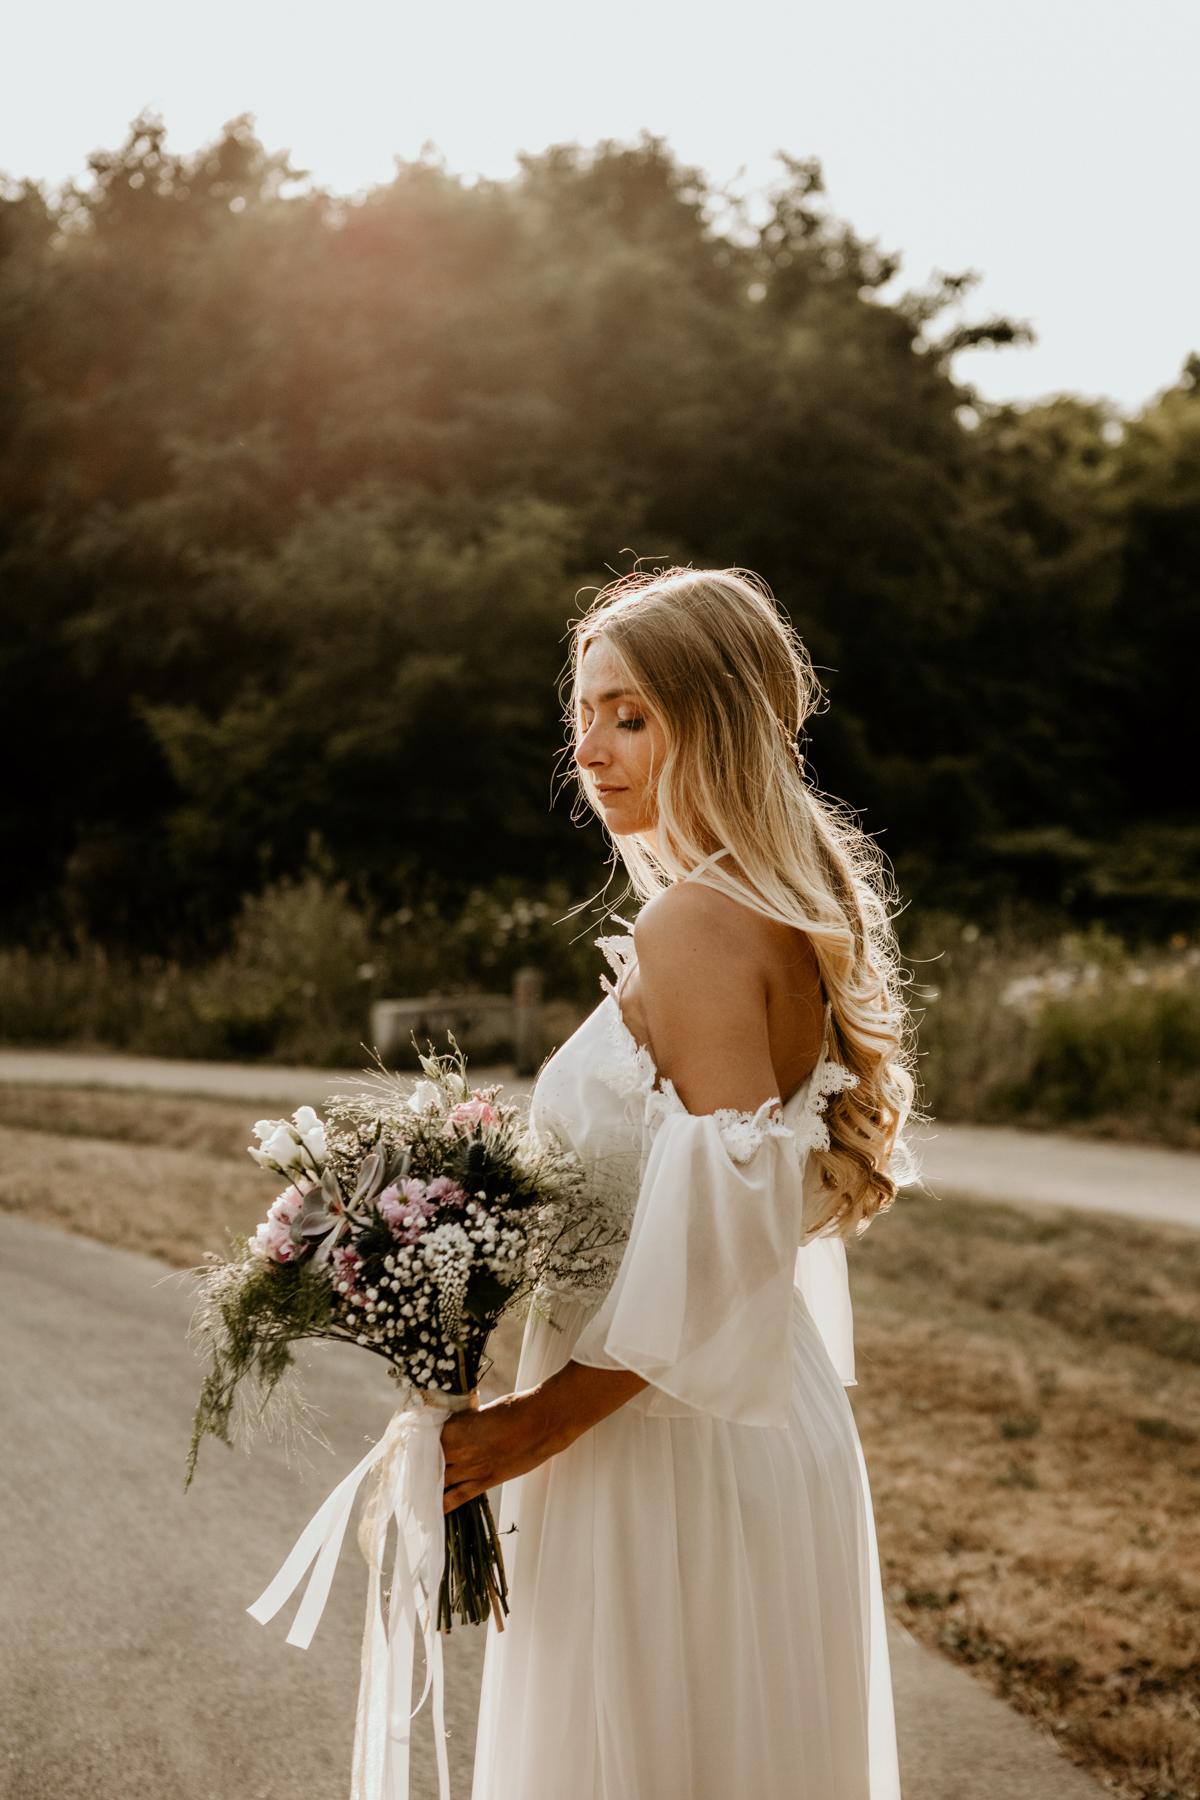 Styled Wedding 1 beeld.schoon-selinderella klein formaat-93